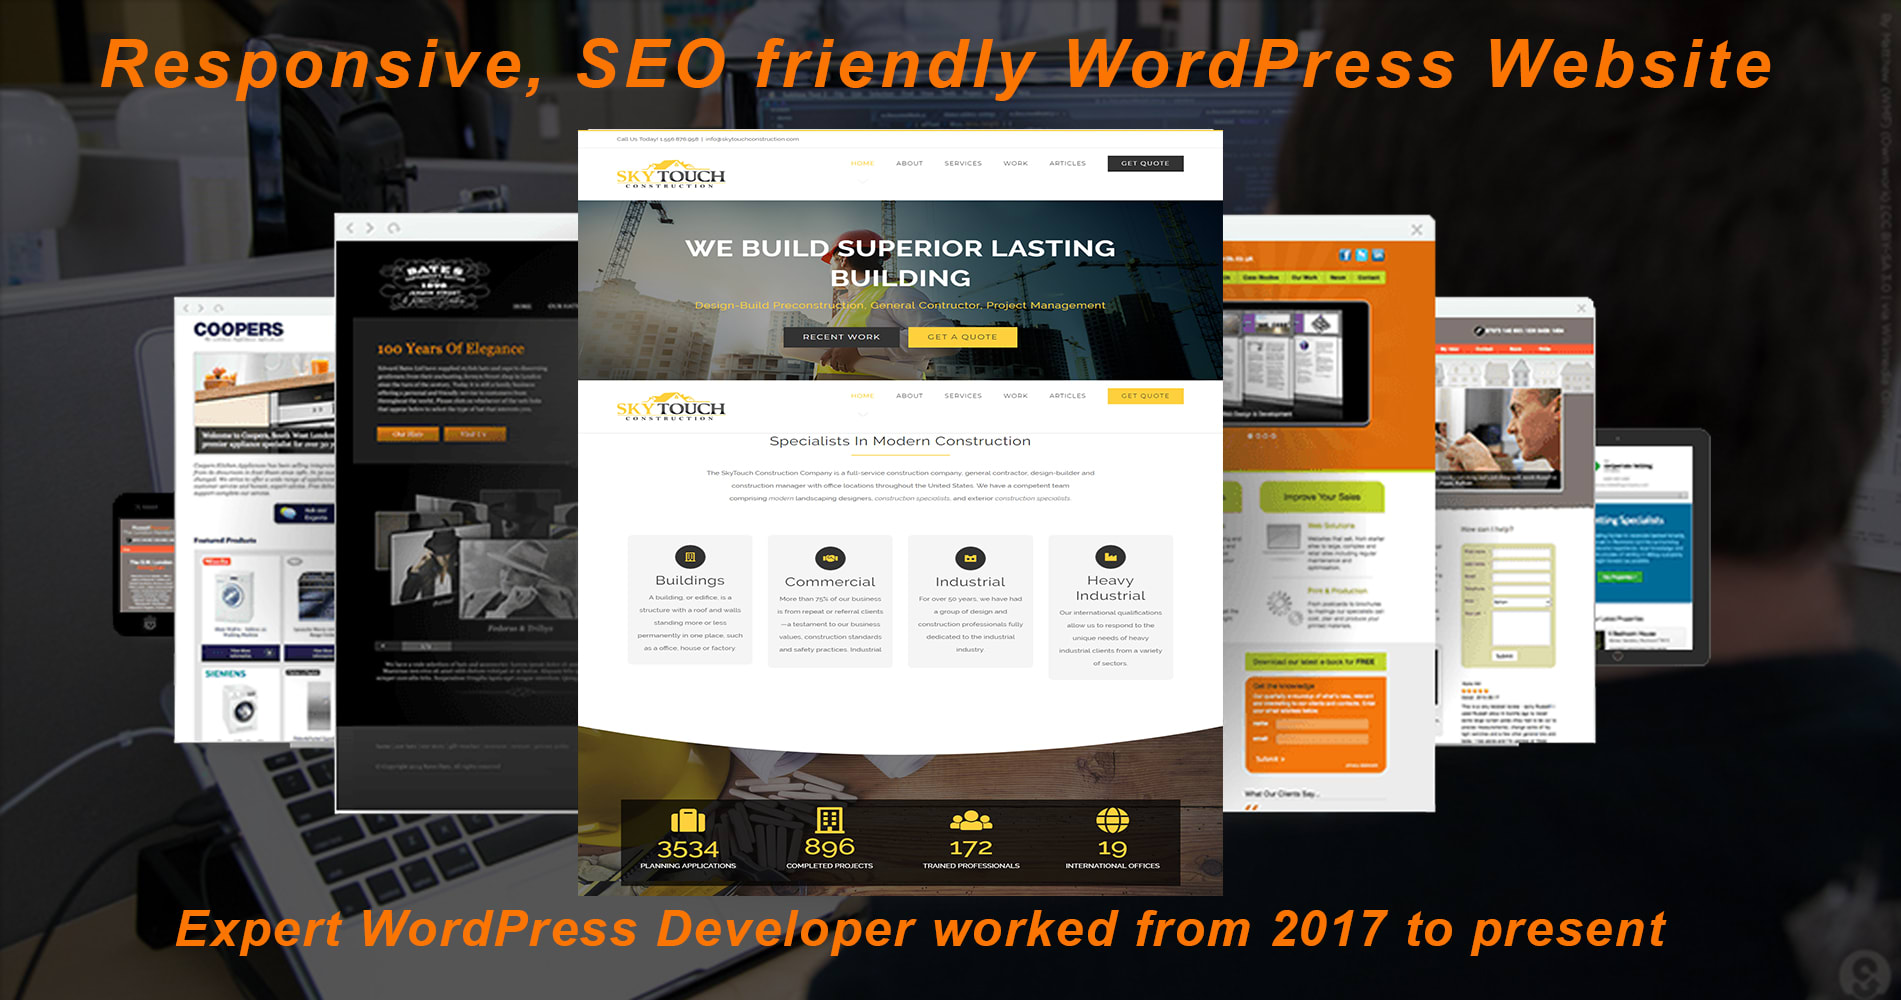 I will do responsive SEO friendly wordpress website design